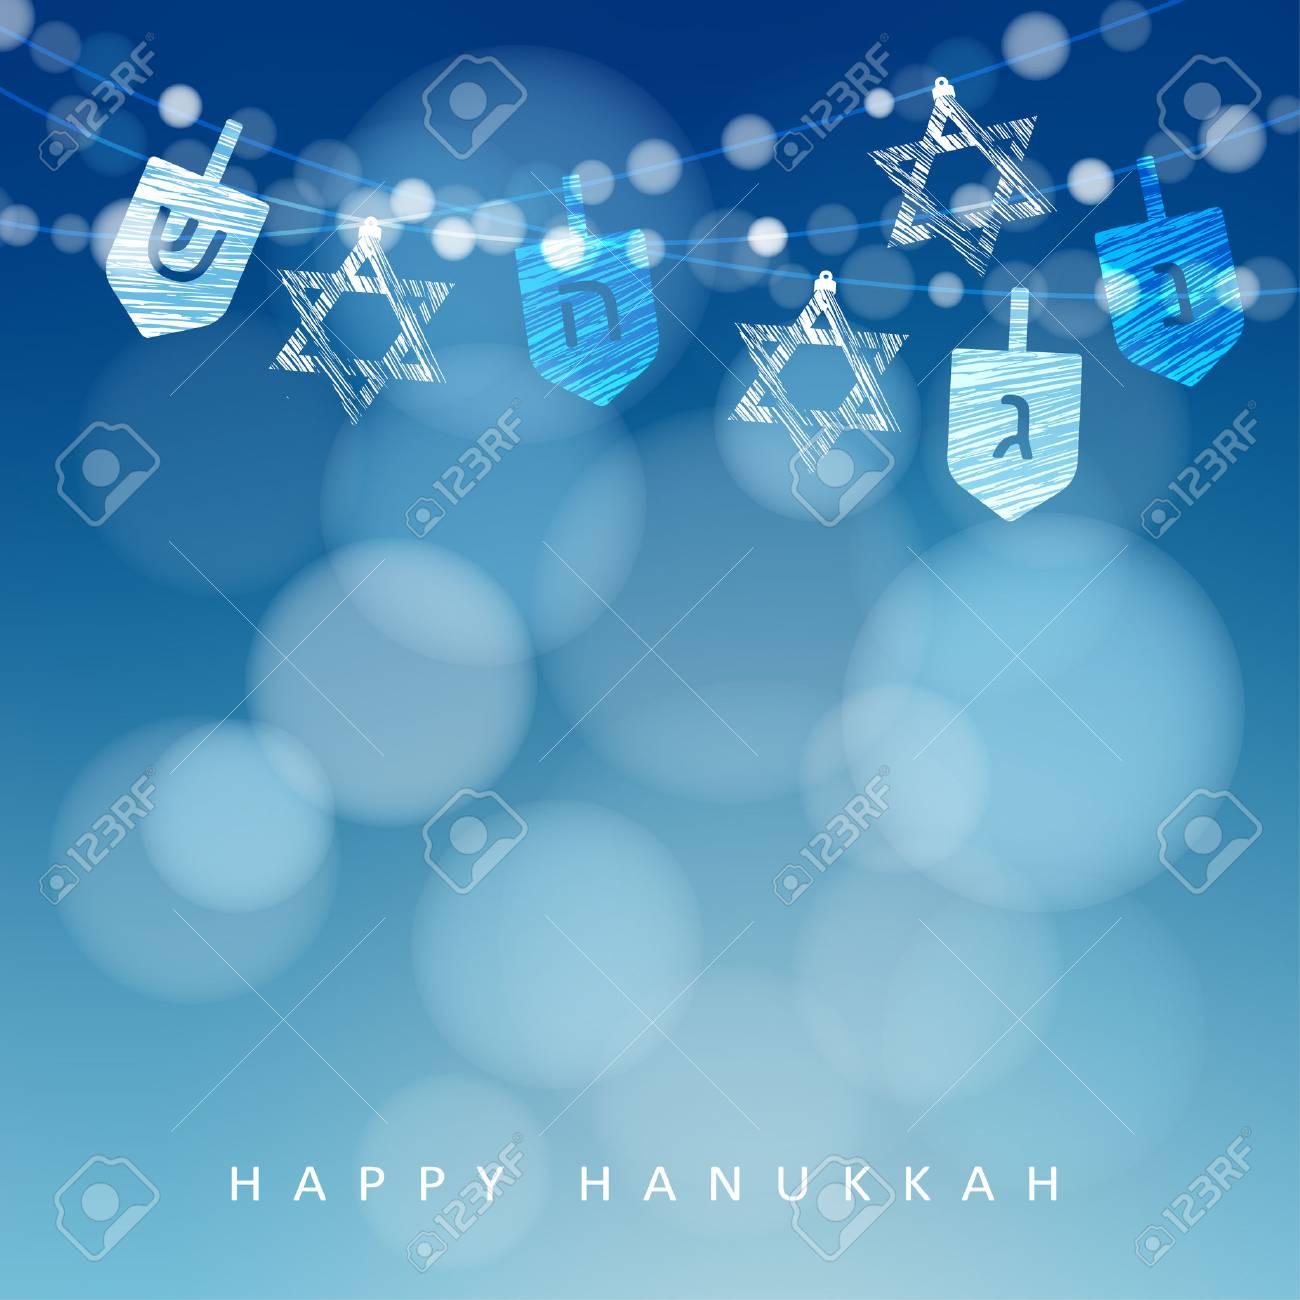 Hanukkah blue background with string of lights, dreidels and jewish stars. Festive party decoration. Modern blurred vector illustration for Jewish Festival of light. - 66323251